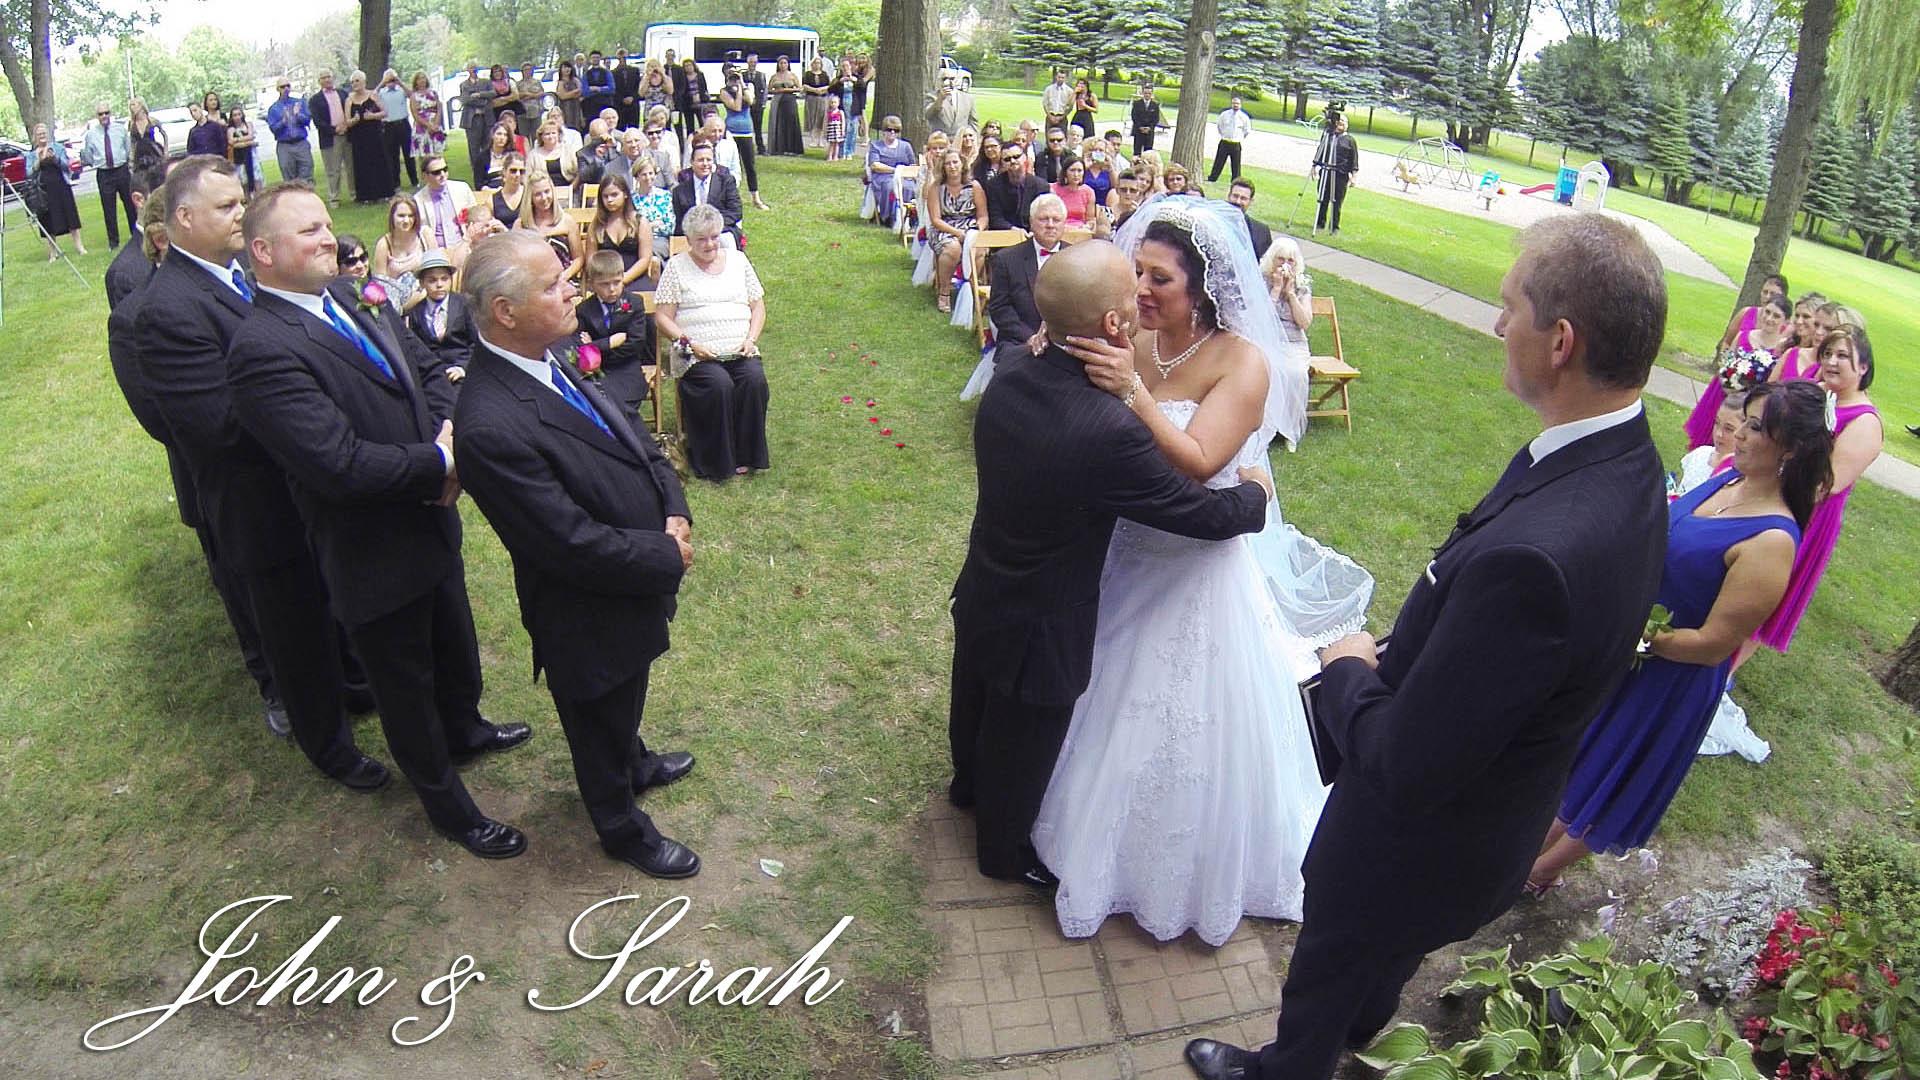 John & Sarah – Buffalo Wedding Videographer